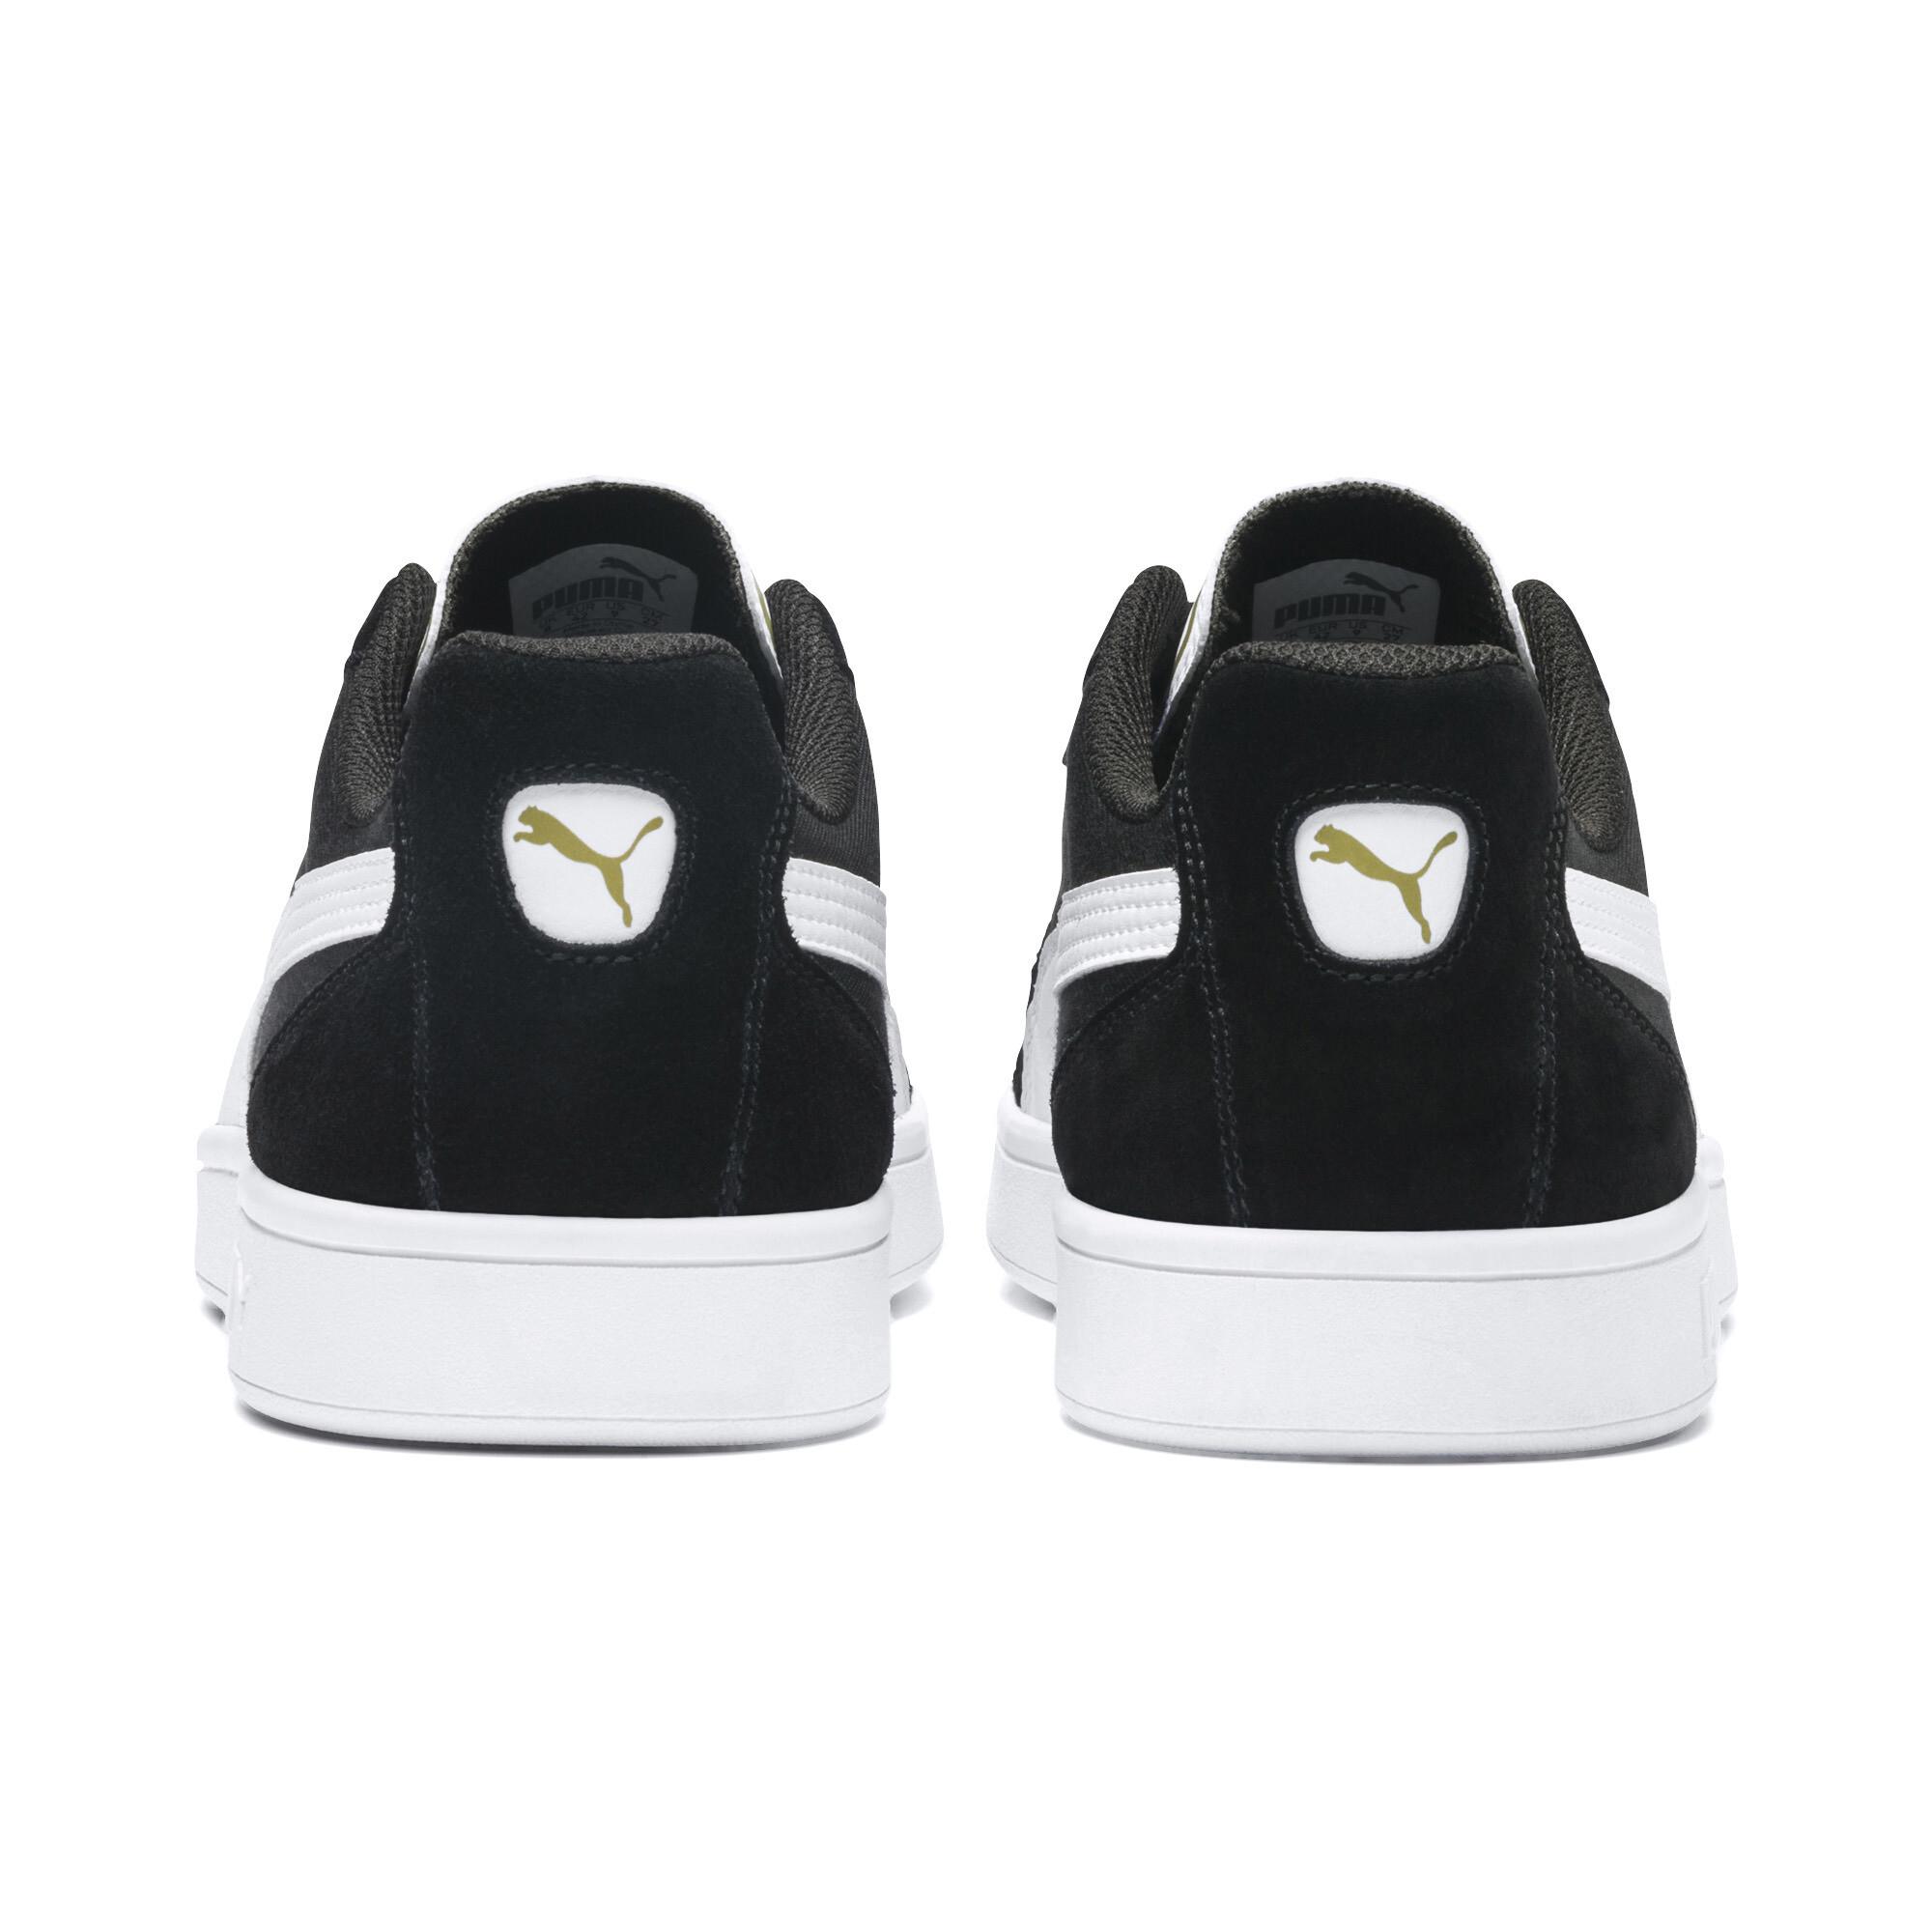 thumbnail 15 - PUMA Men's Astro Kick Sneakers